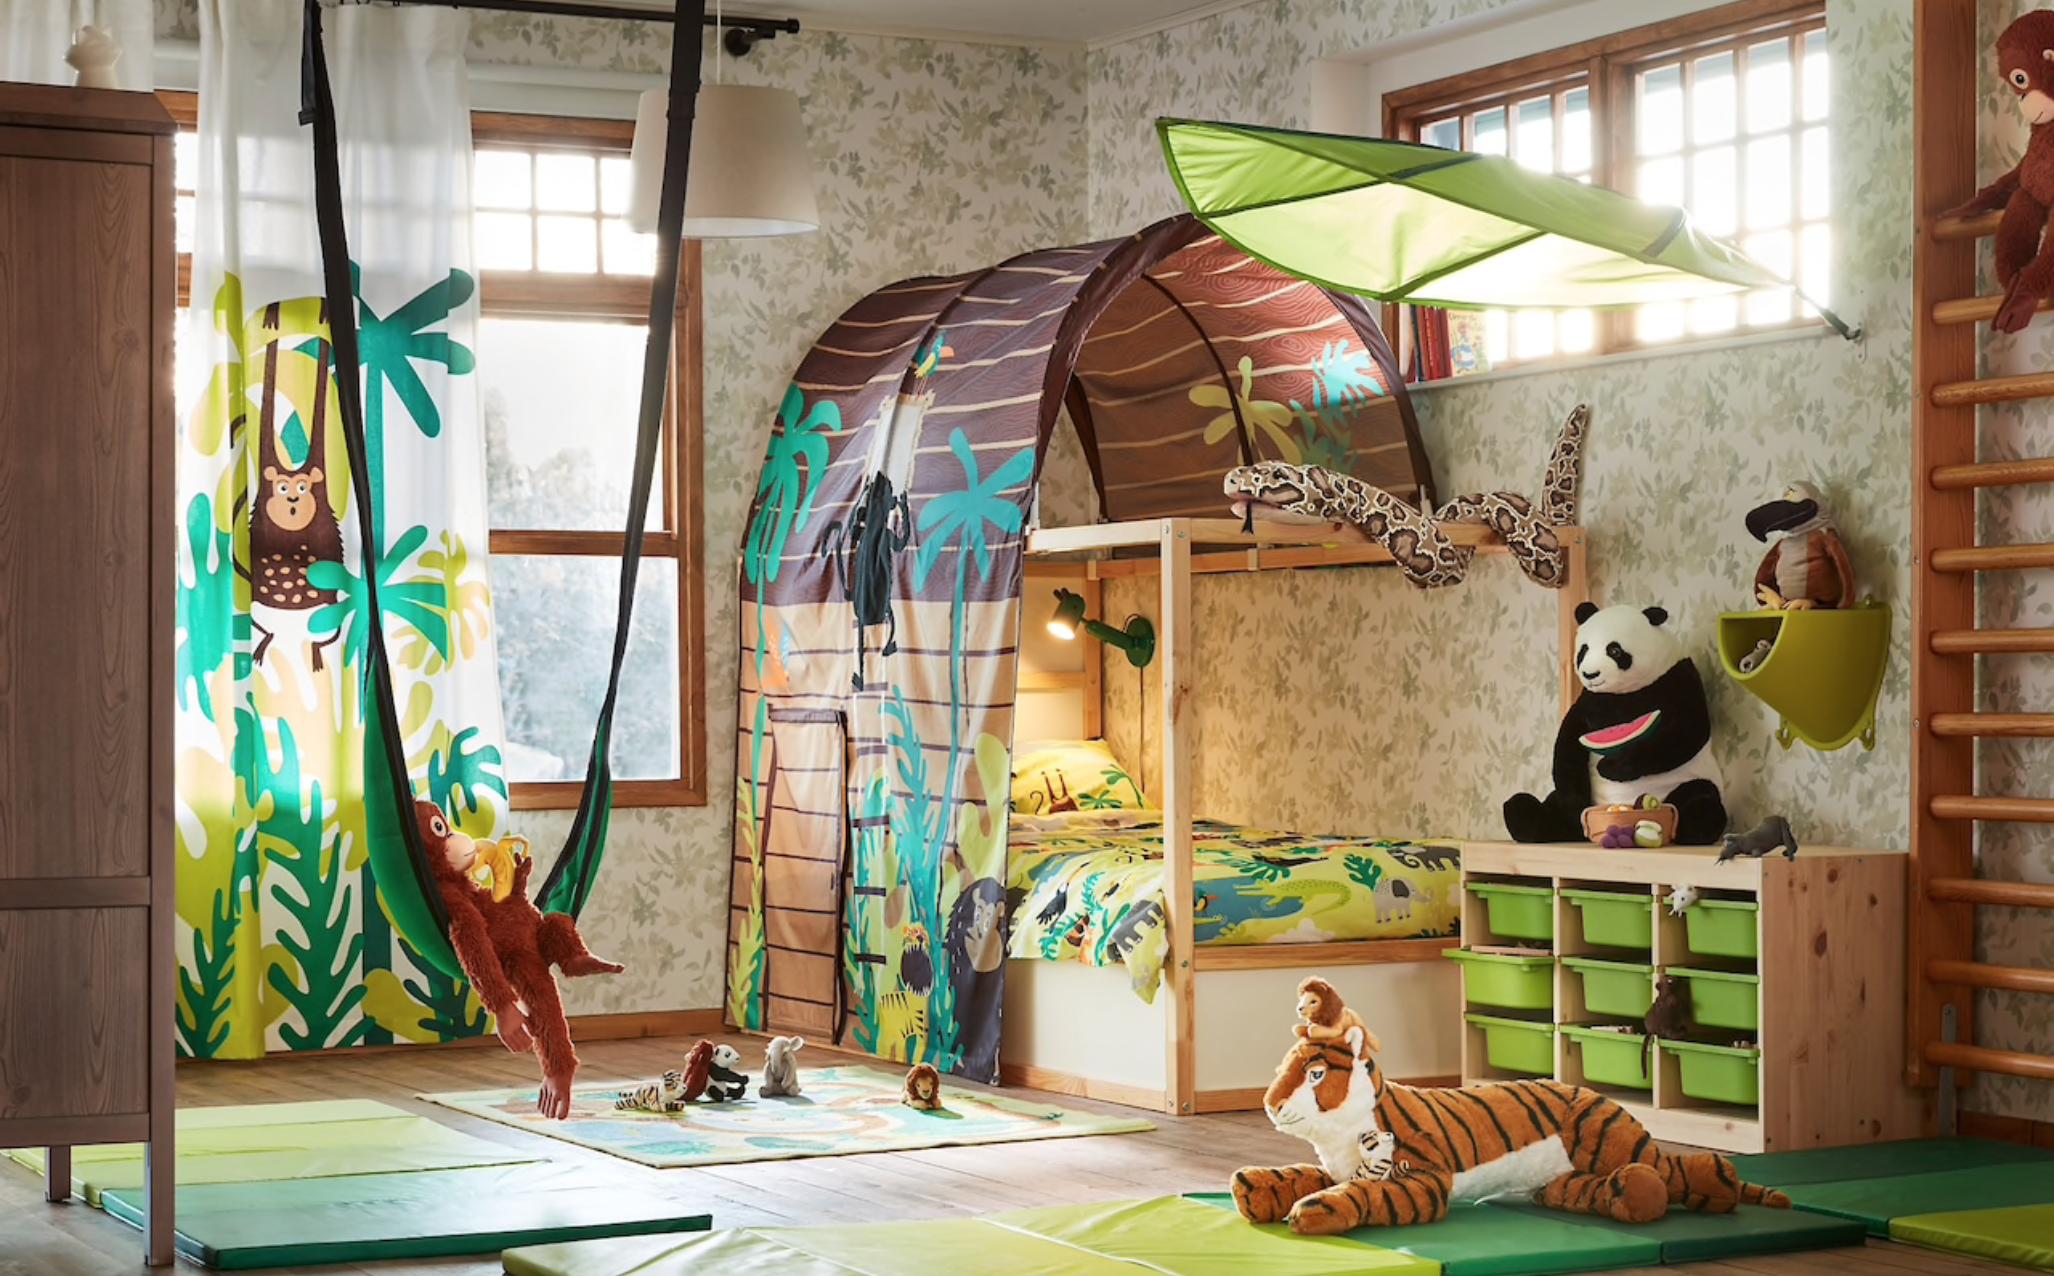 Ikea jungle inspired room idea for kids #Kidsroomideas  Jungle